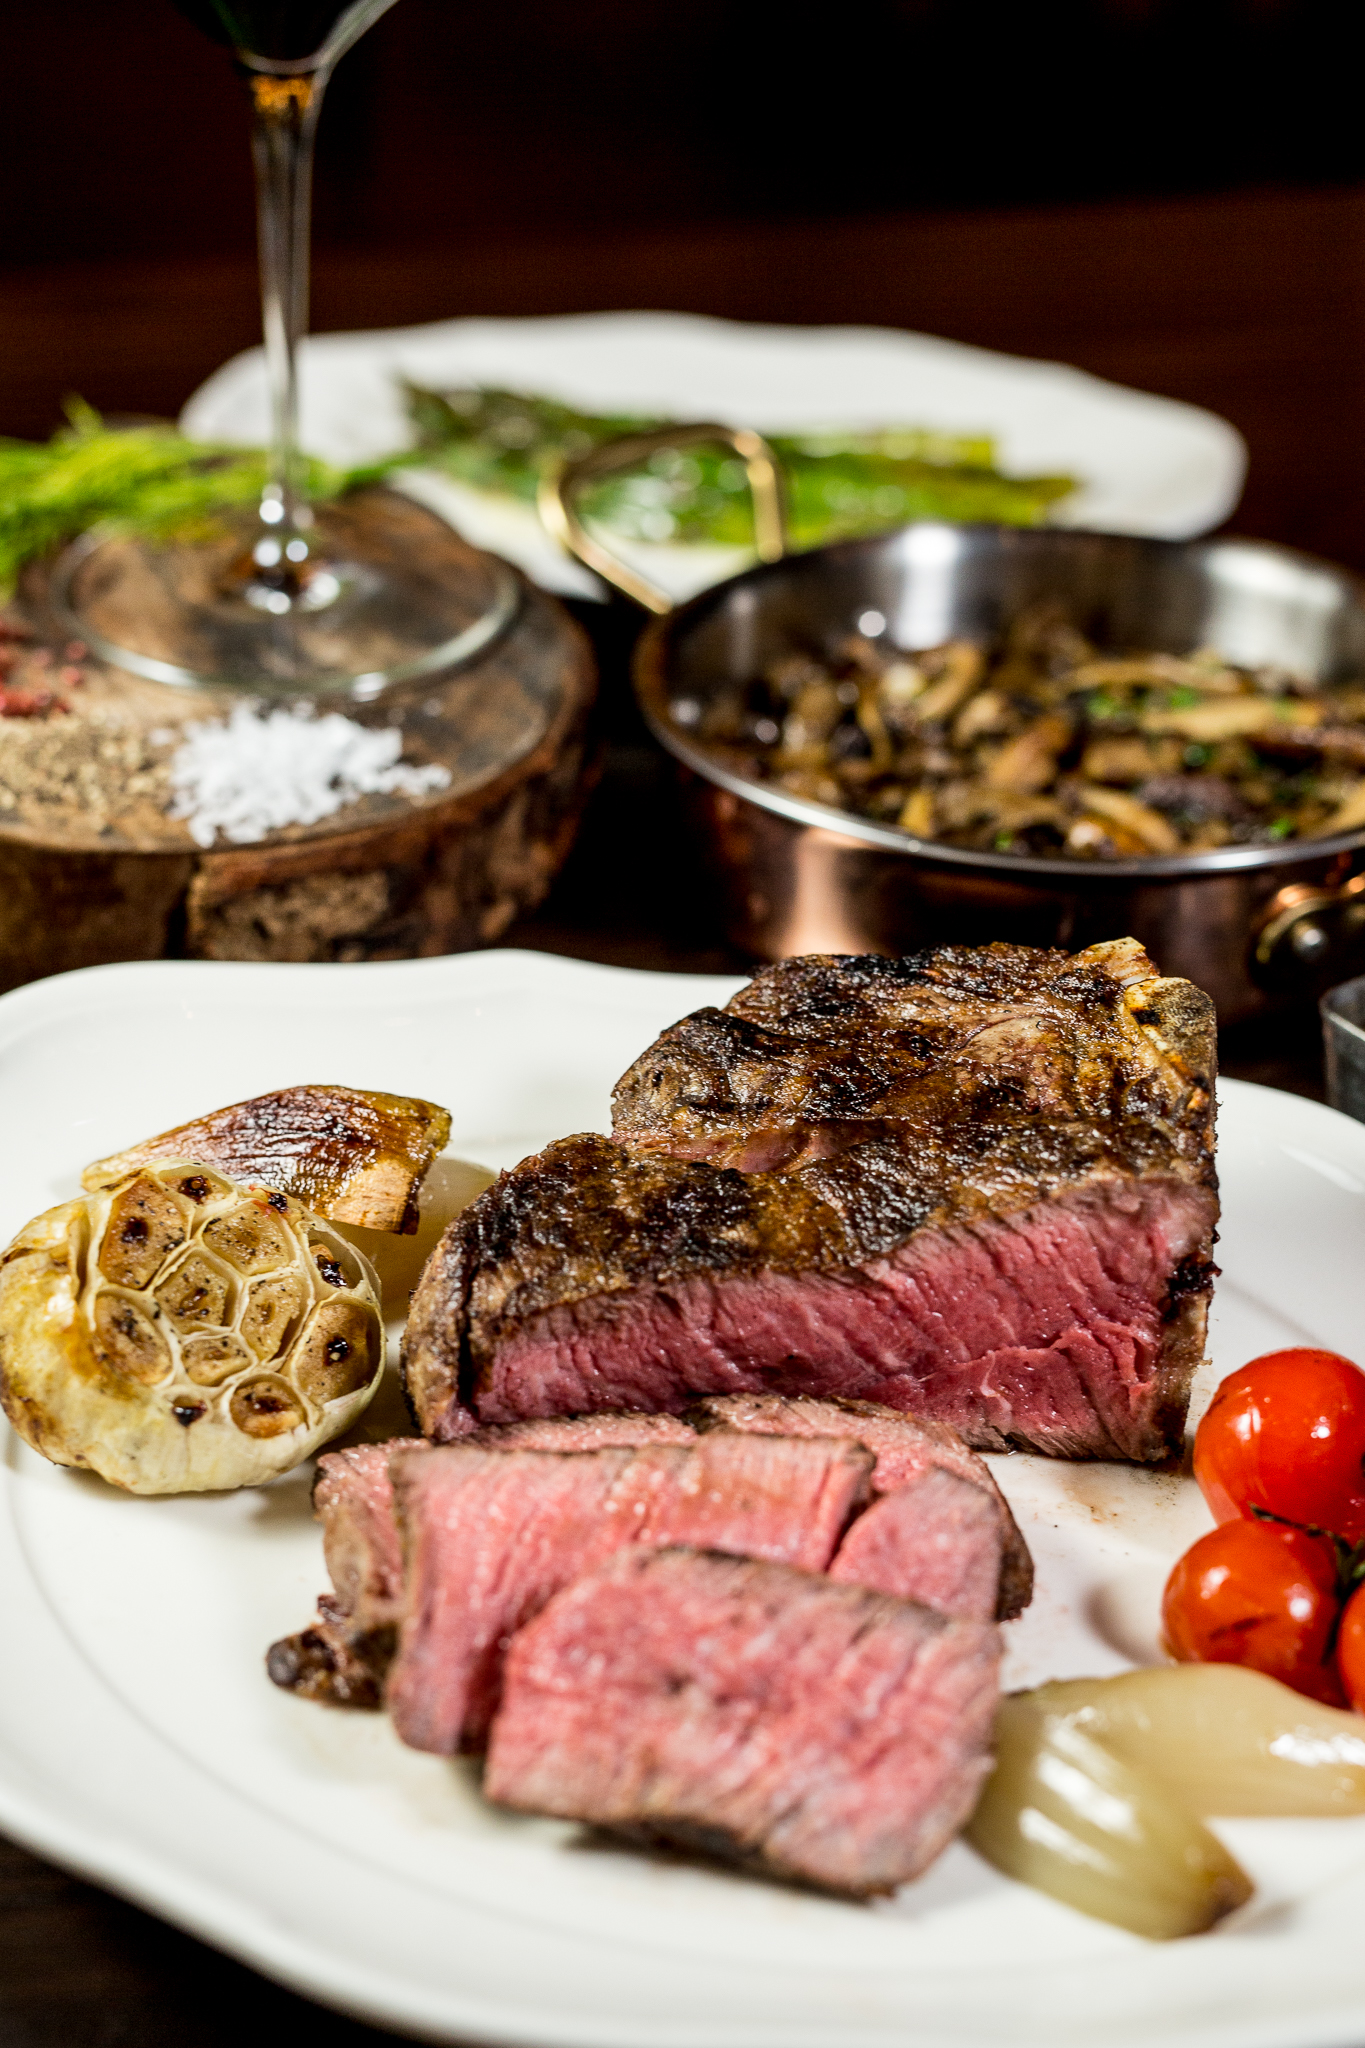 Bull & Bourbon - Marbled Steak with Vegetables